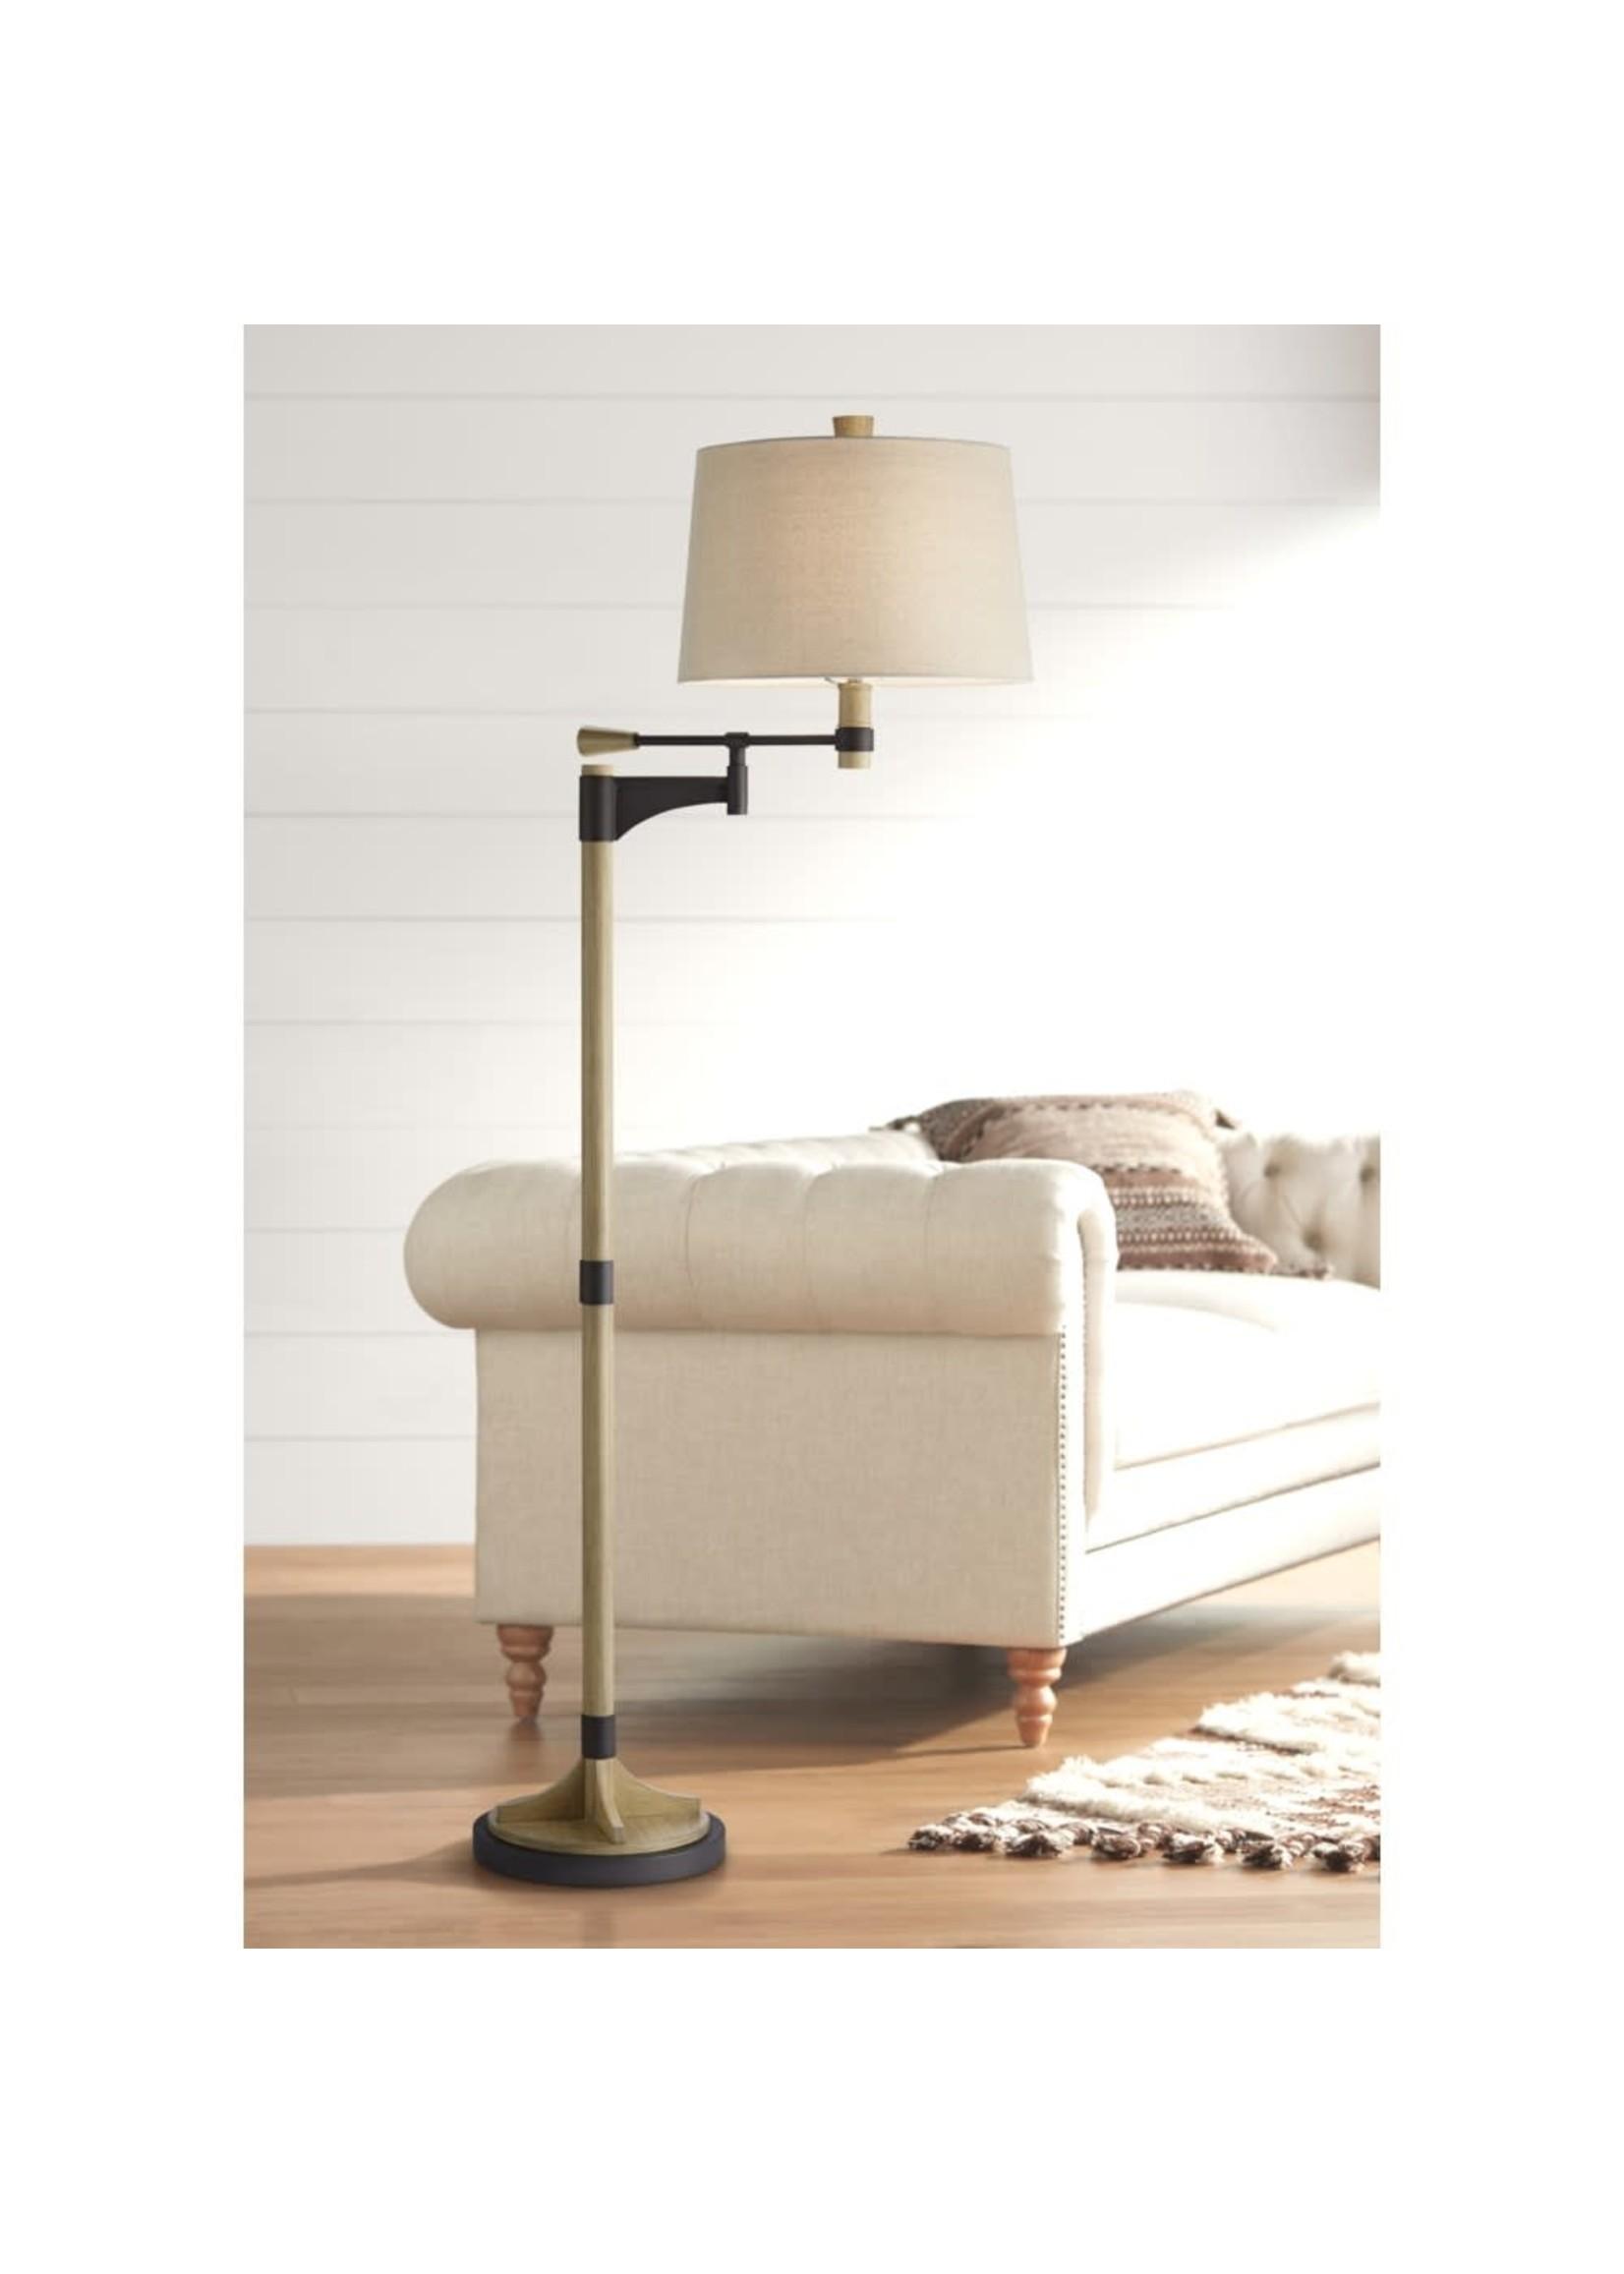 PARK CITY FLOOR LAMP